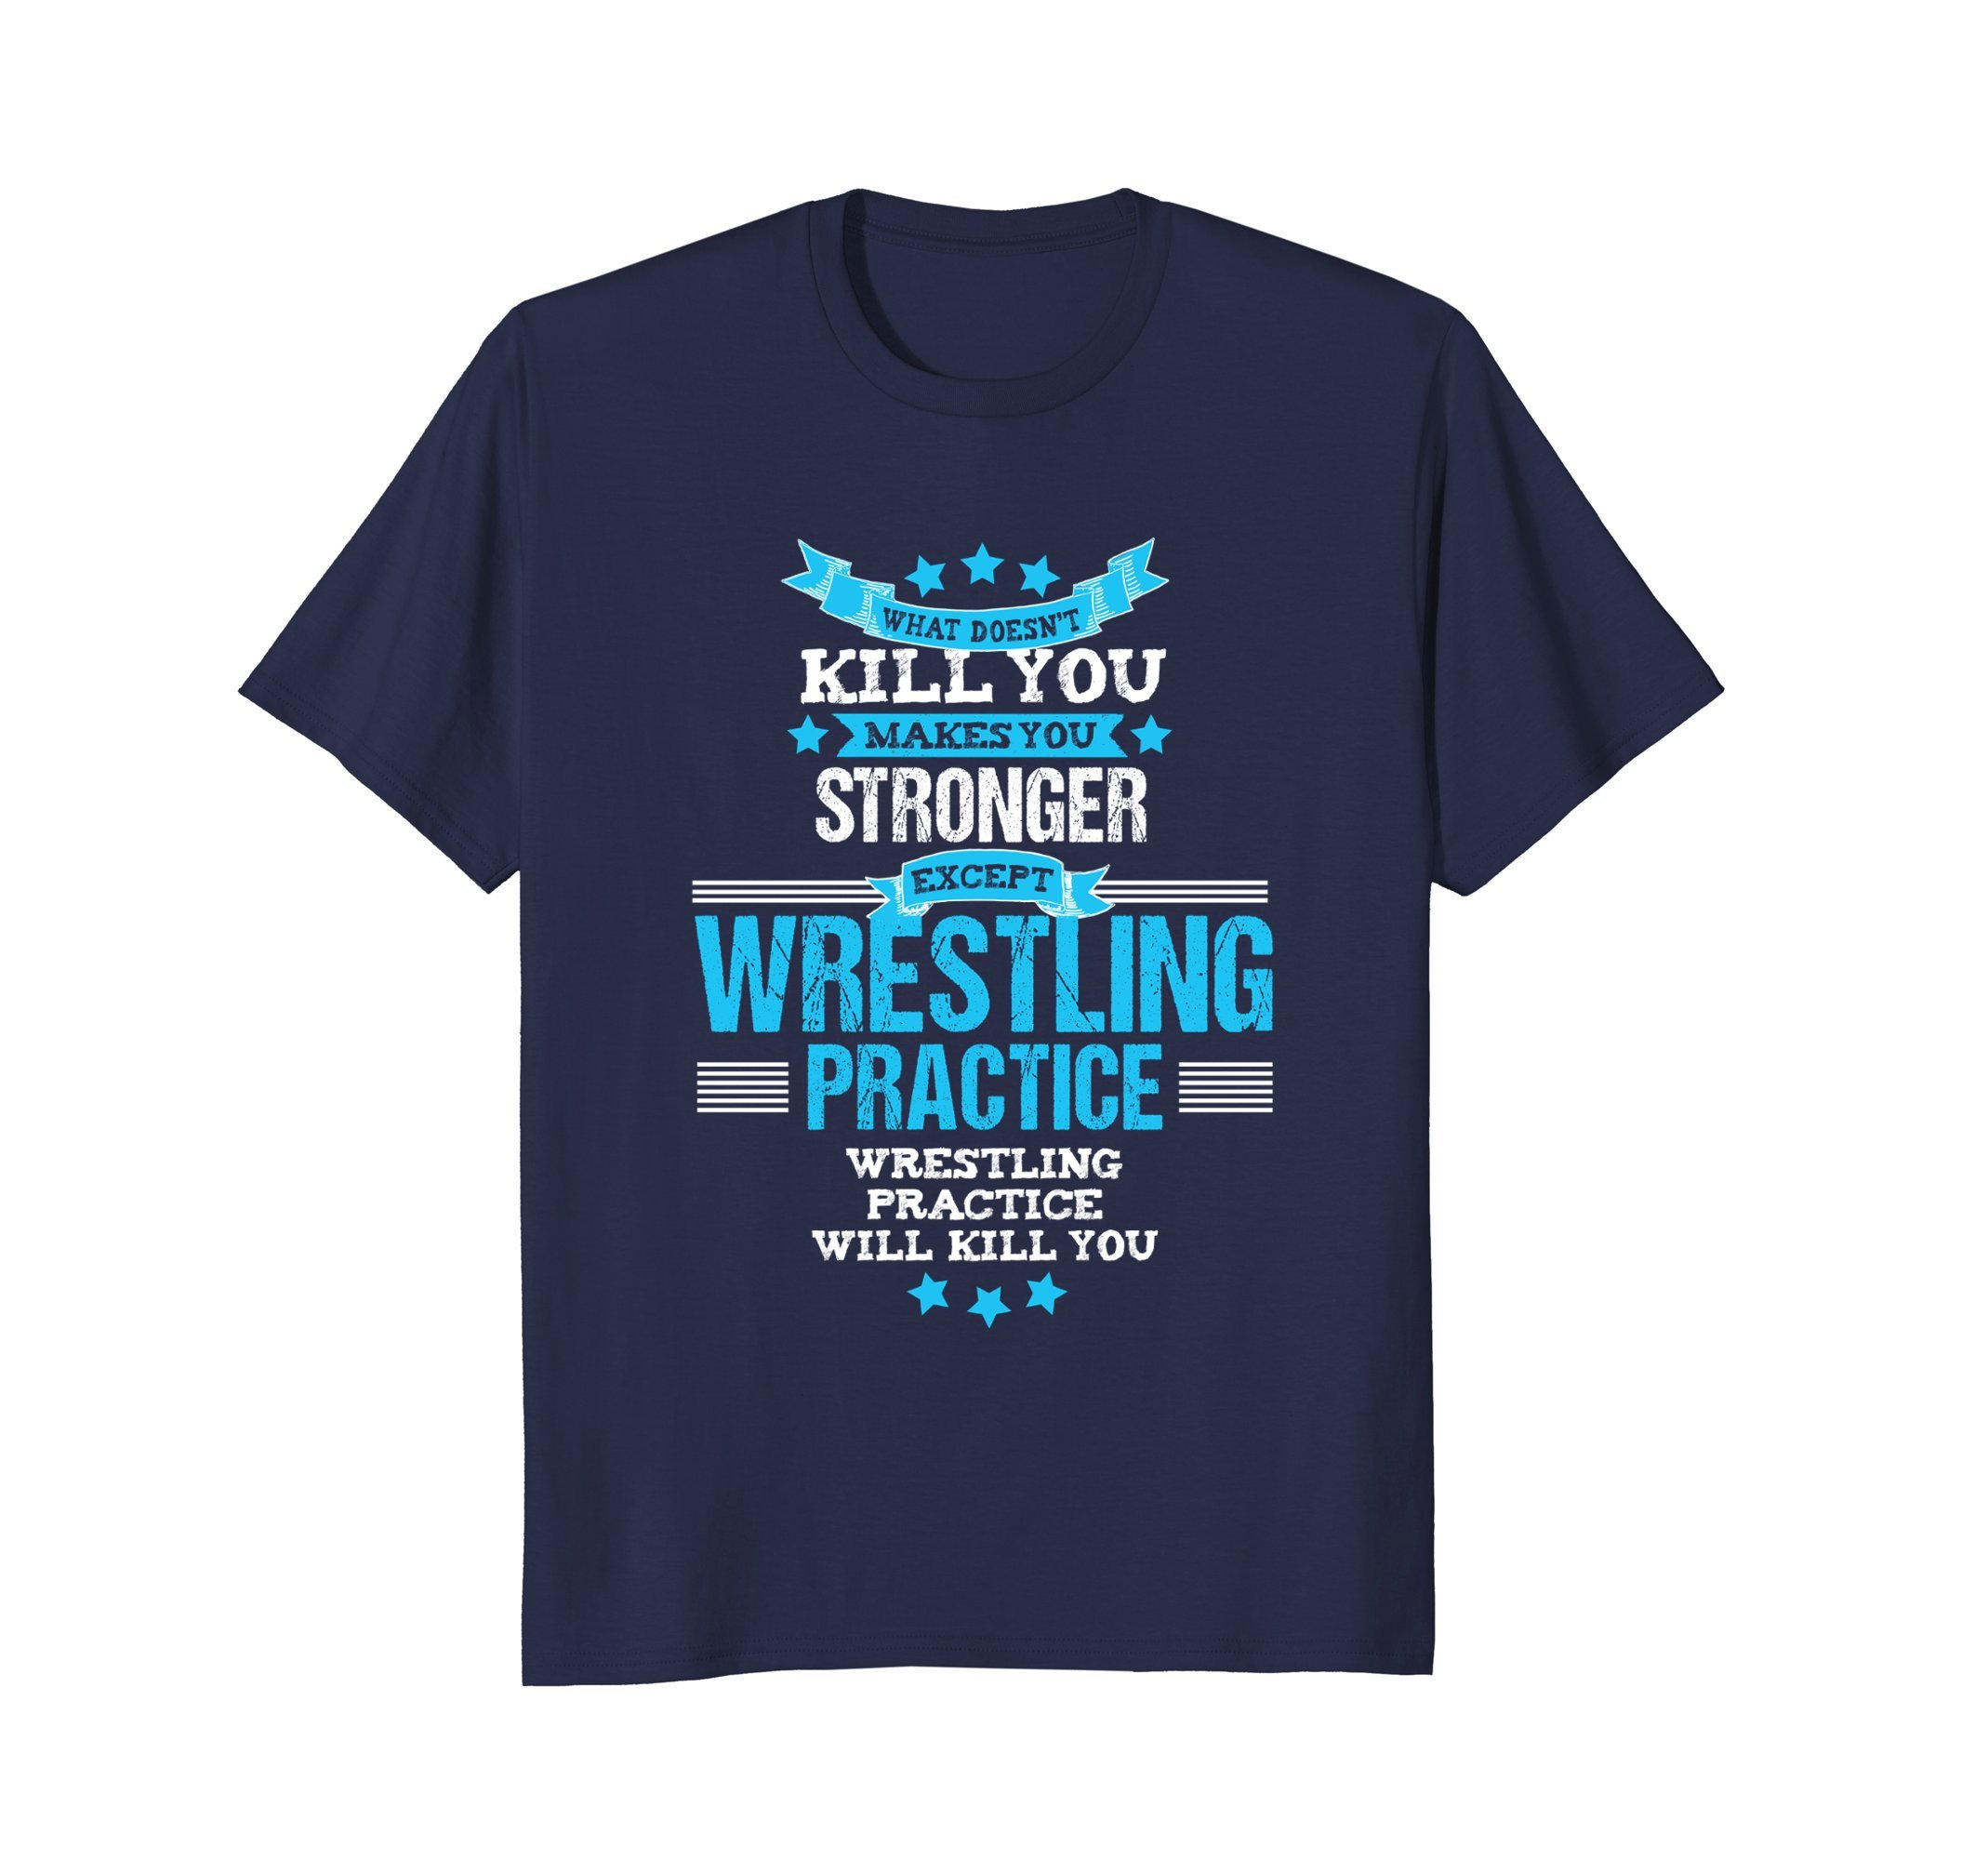 Mens Funny Wrestling Coach Tshirt Team Wrestler Gift 2XL Navy by Funny Sports Coach Tees